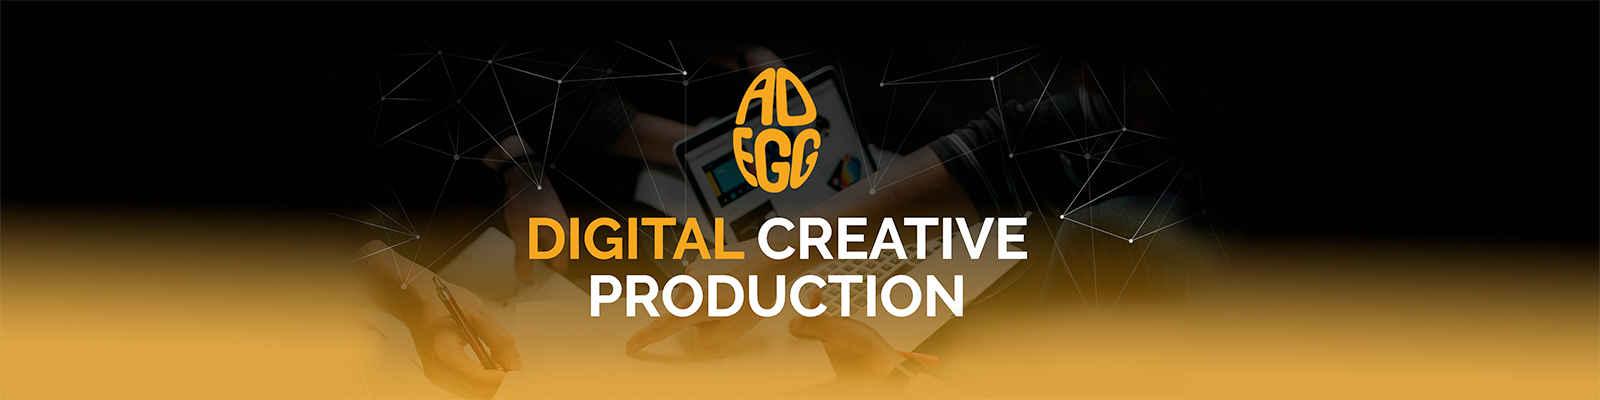 ADEGG DIGITAL & CREATIVE banner fotograf